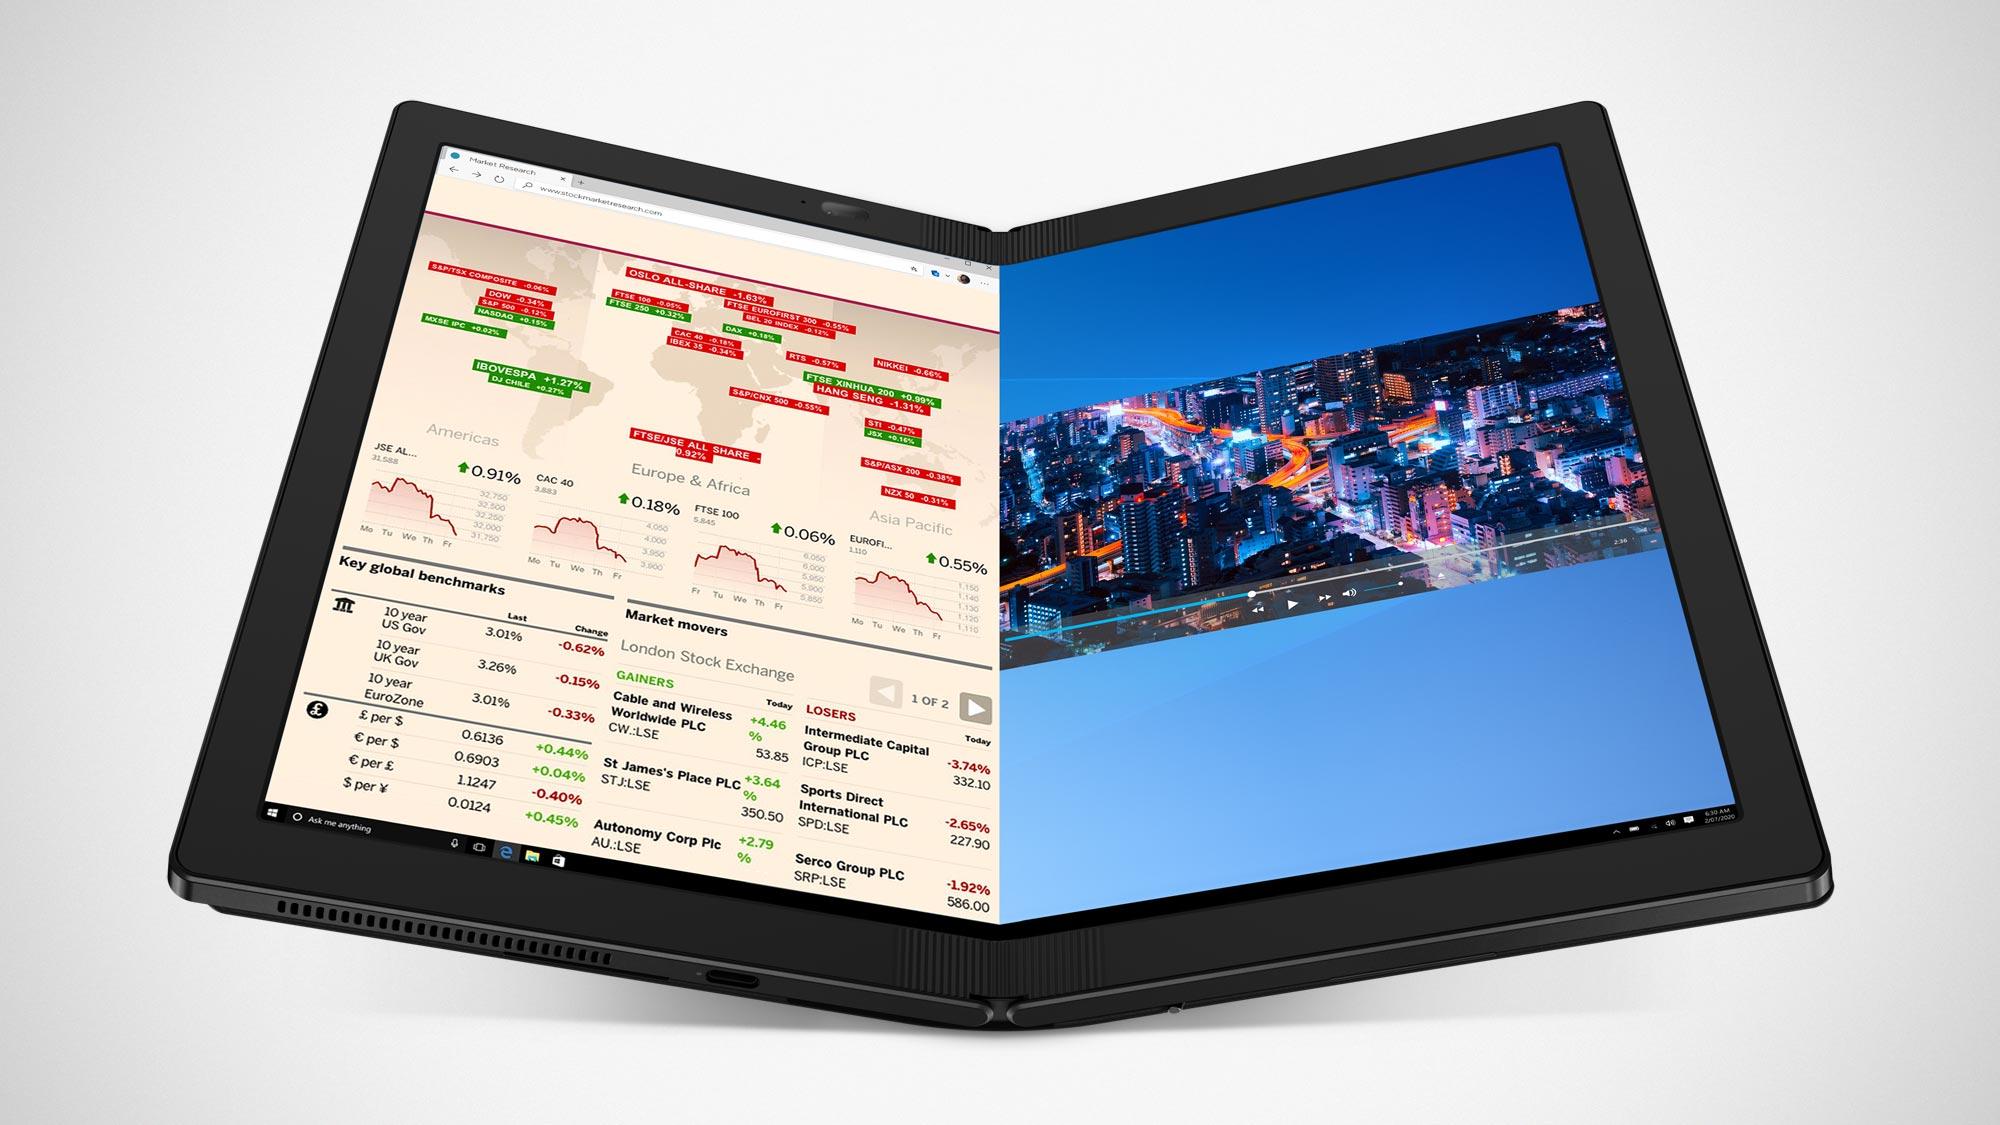 Lenovo ThinkPad X1 Fold Opens for Pre-order